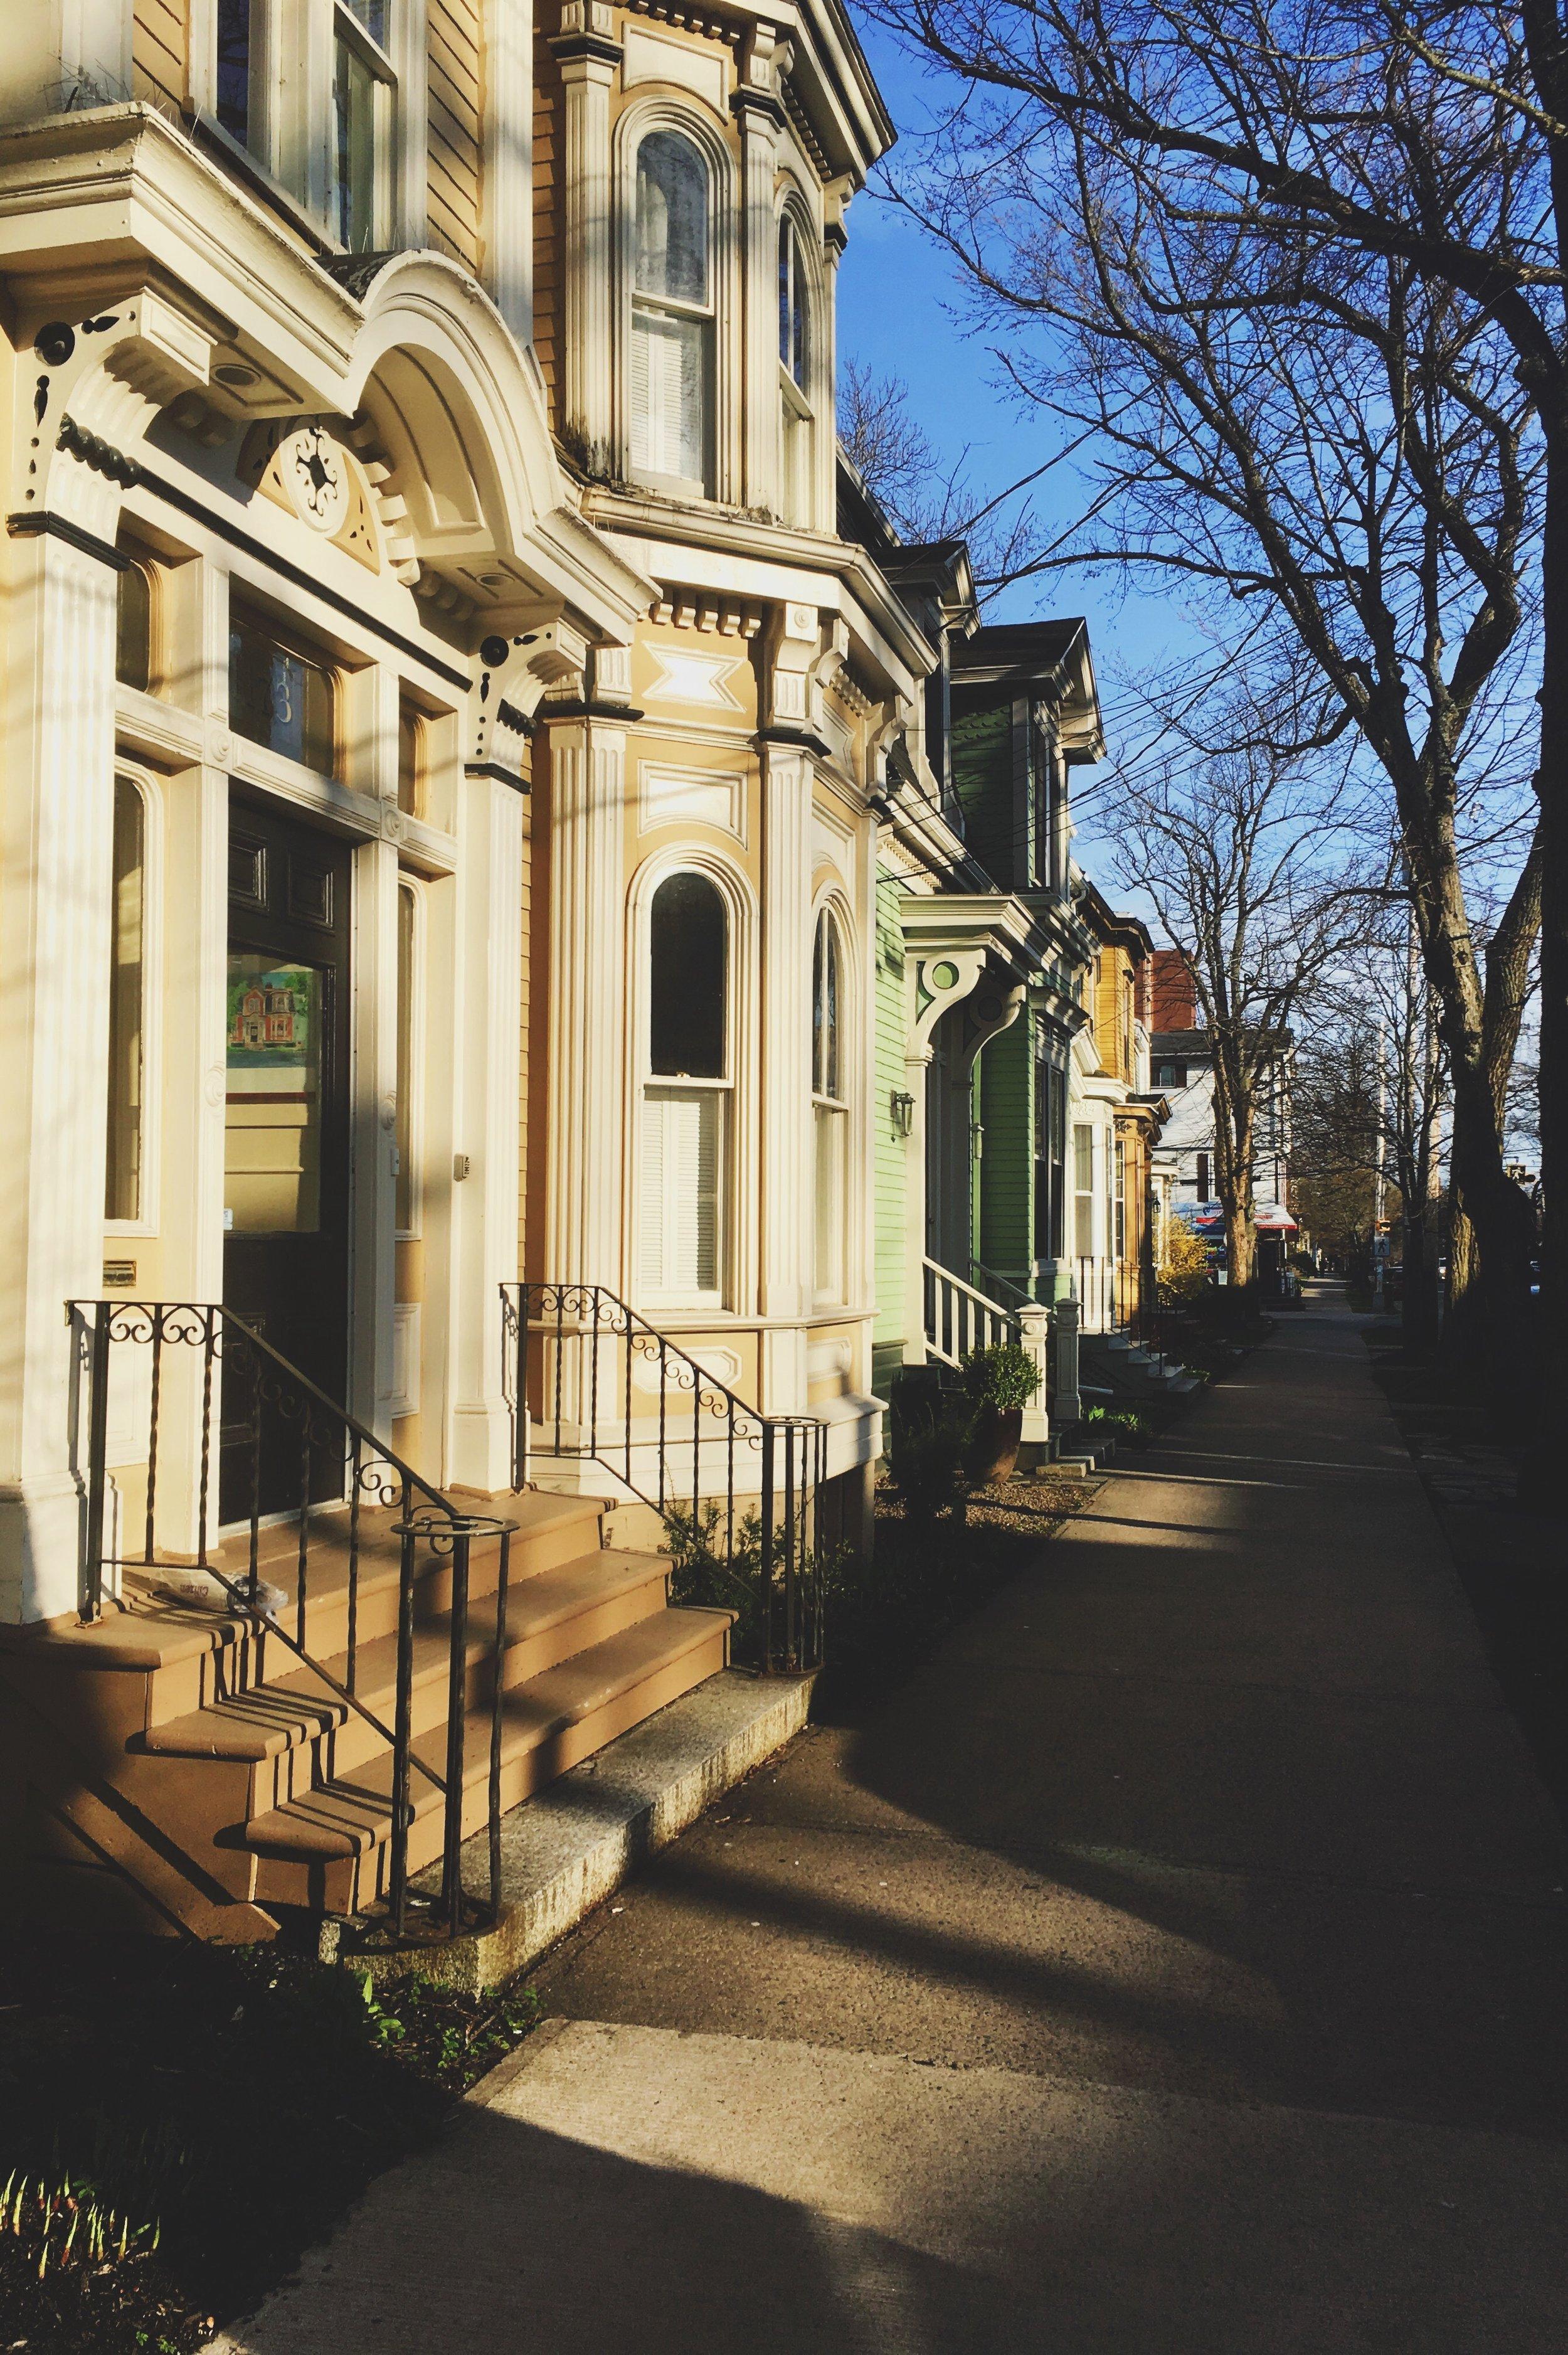 April 27th - Streets of Halifax